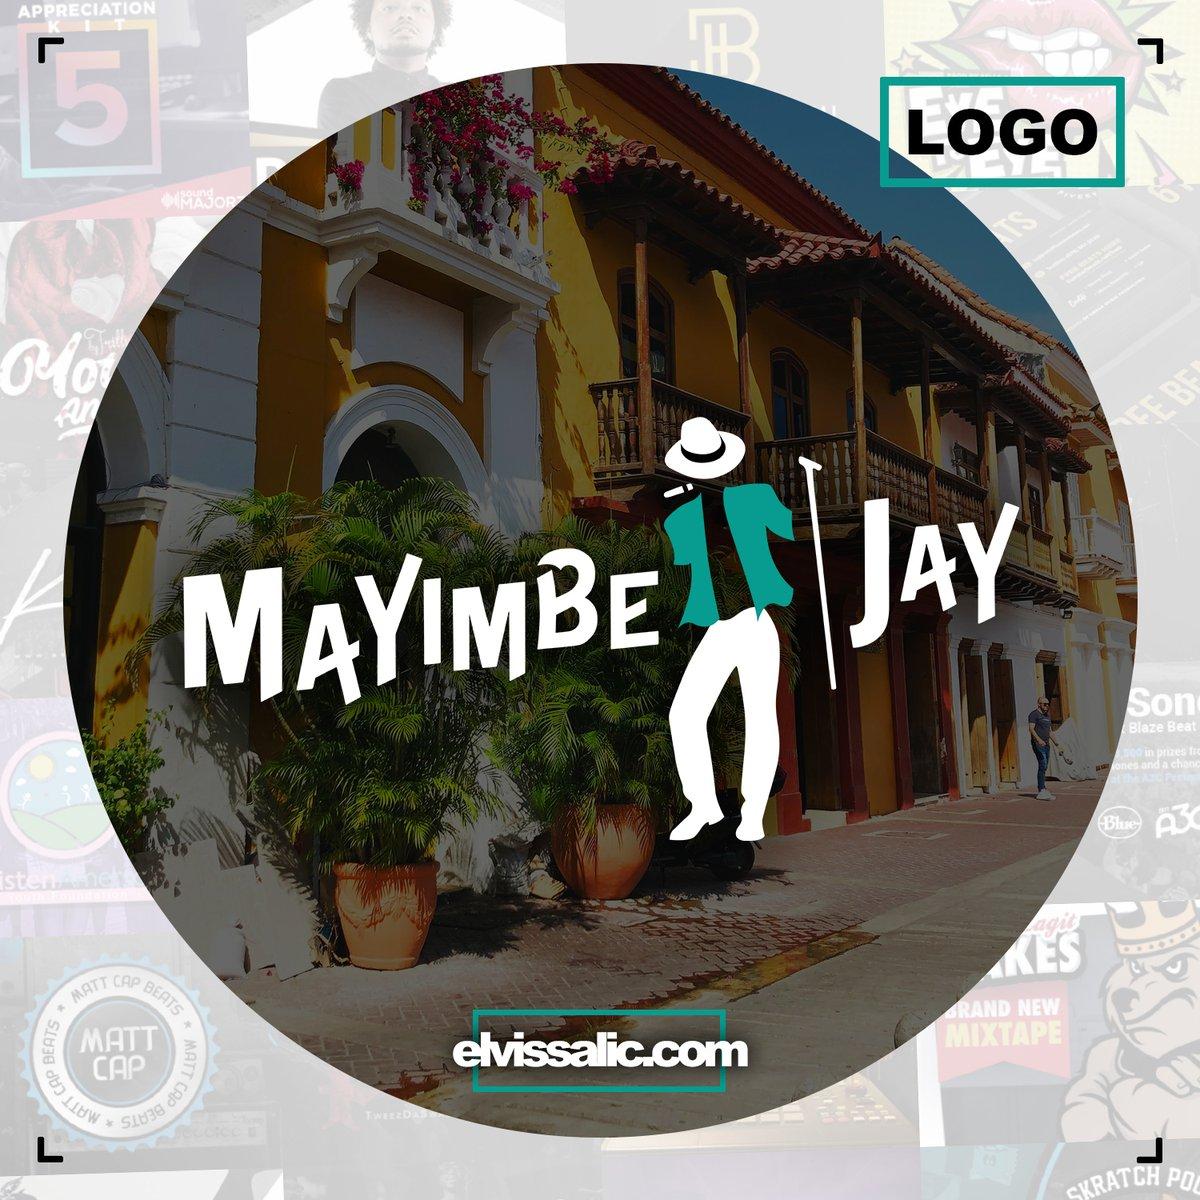 Logo development for Mayimbe Jay  #graphic #design #logo #development #logodesign #logocreation #logodesigner #graphicdesignerforhire #professional #logoinspirations #logoinspire #music #production #beats #beatmaker #musiccreation #musicproduction #branding #designofthedaypic.twitter.com/HuN4lKYhCK